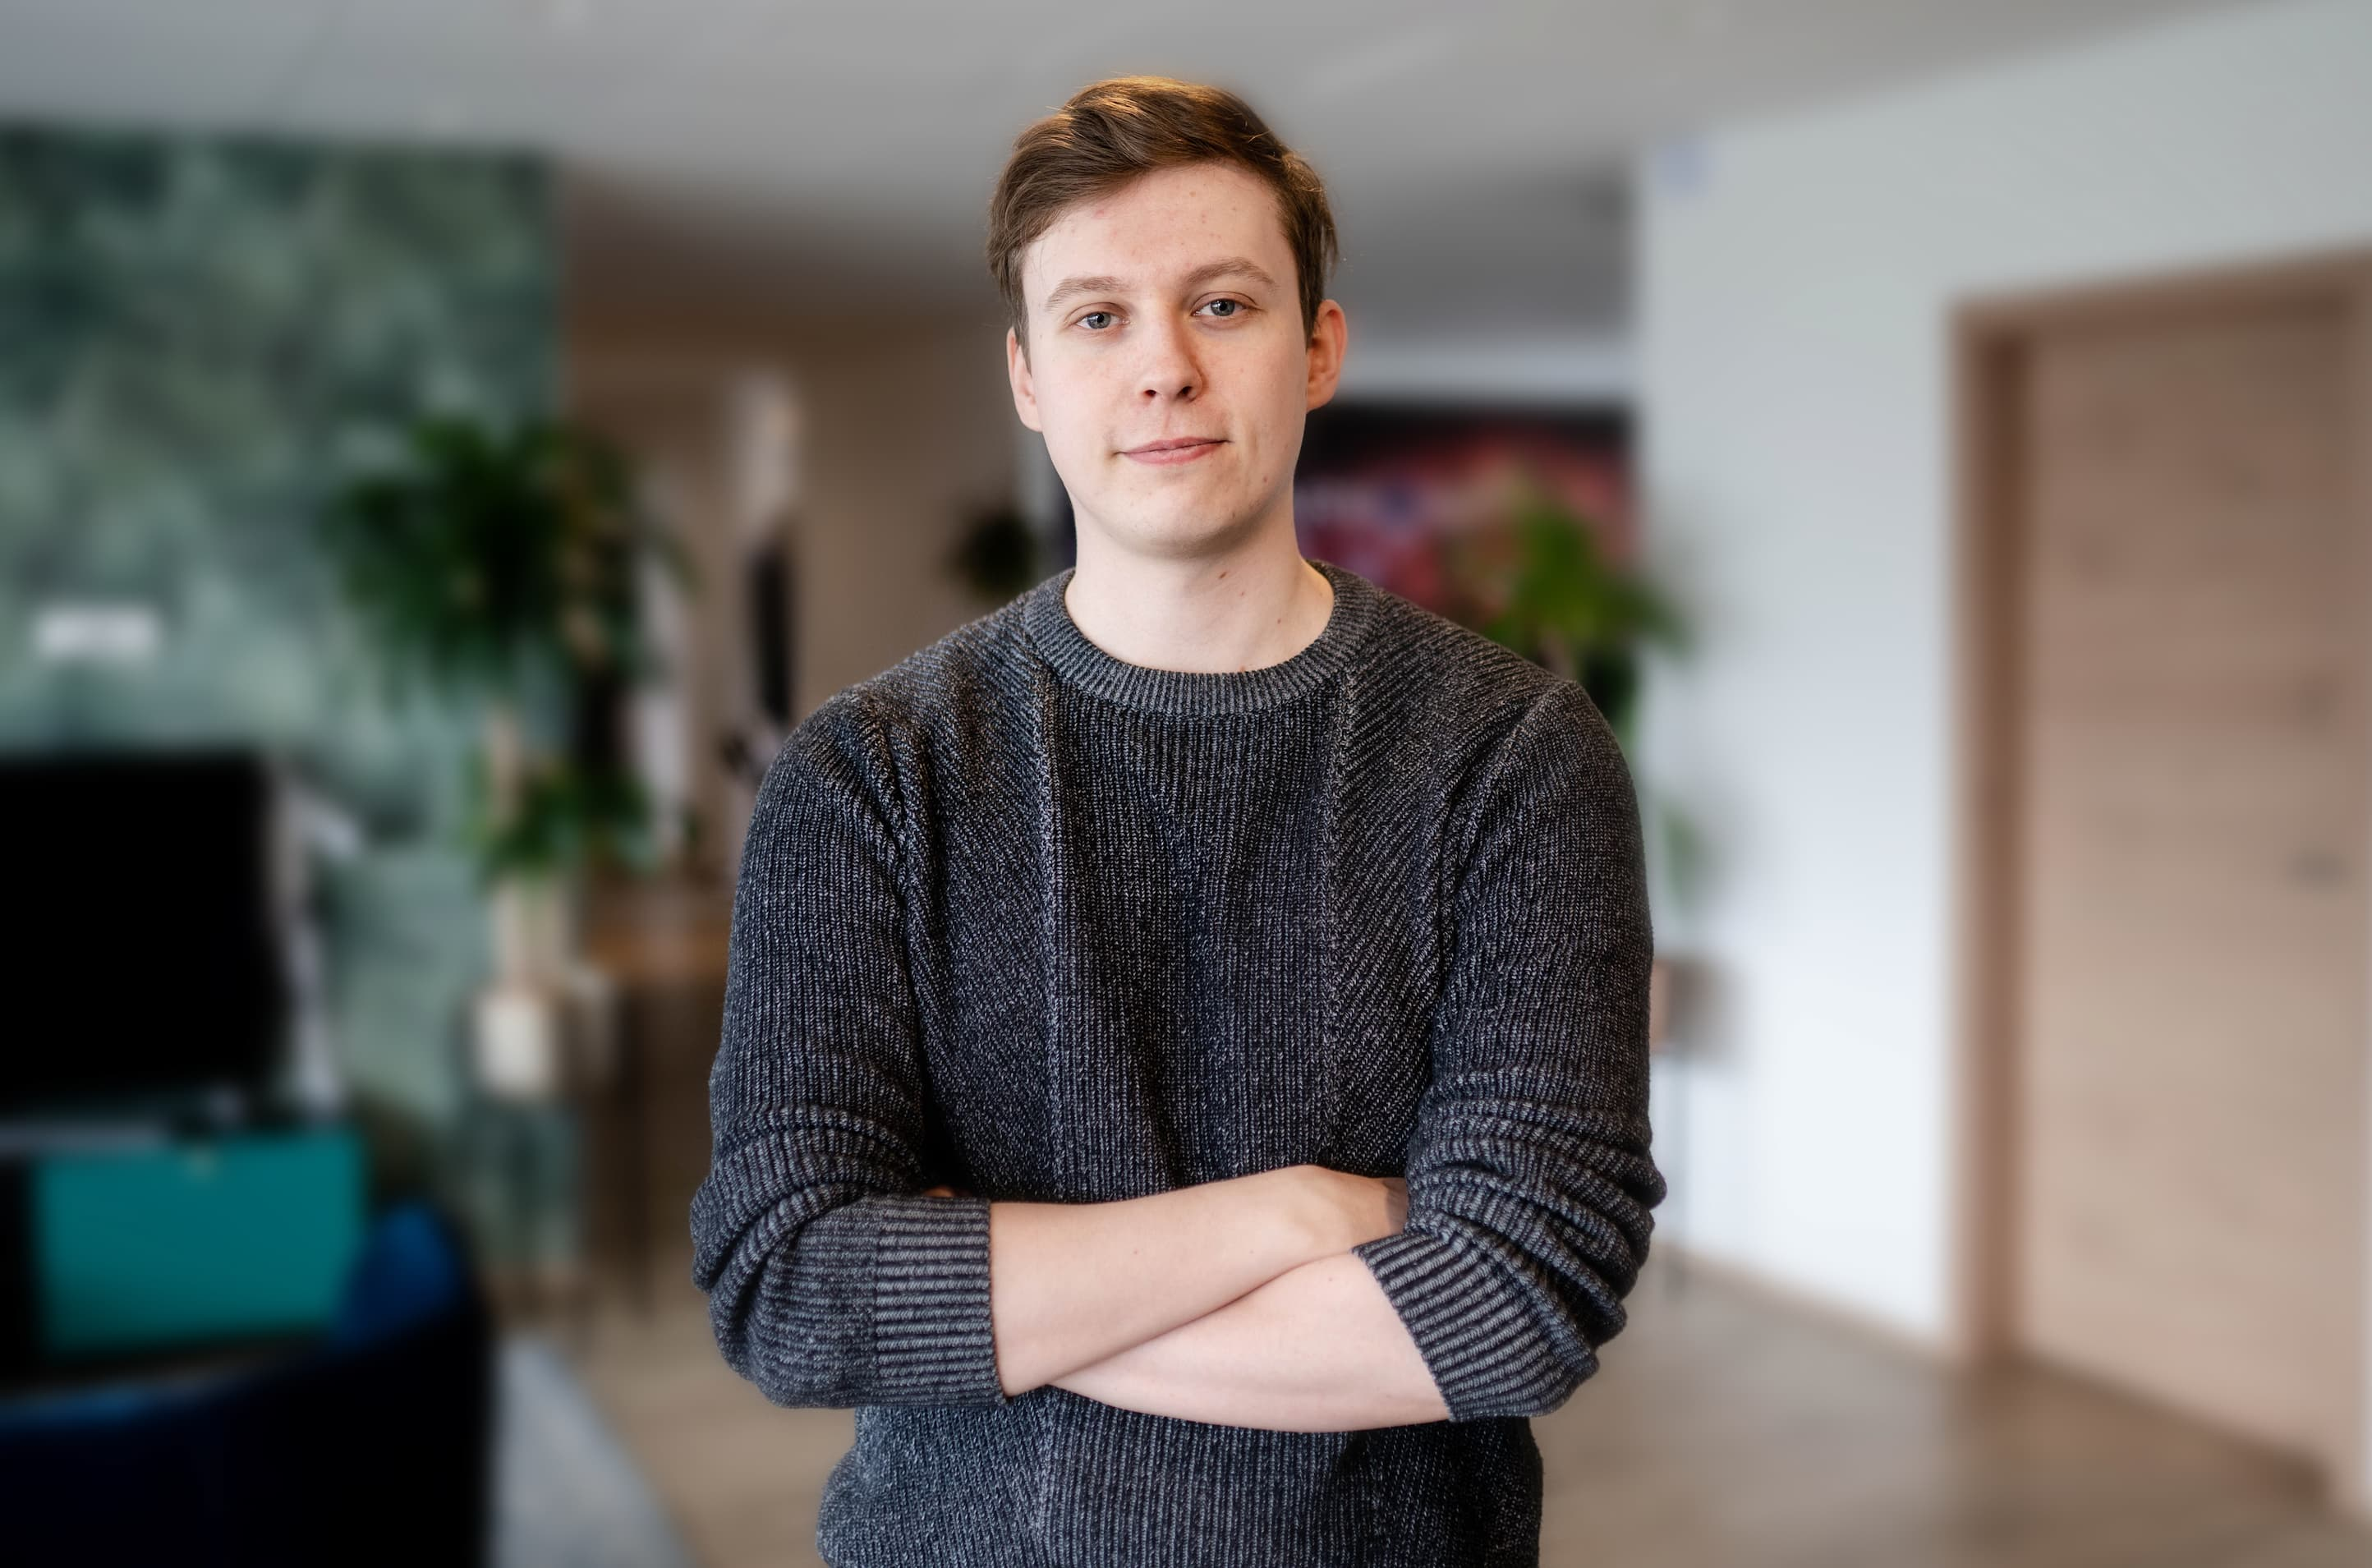 Egill Sigurjónsson